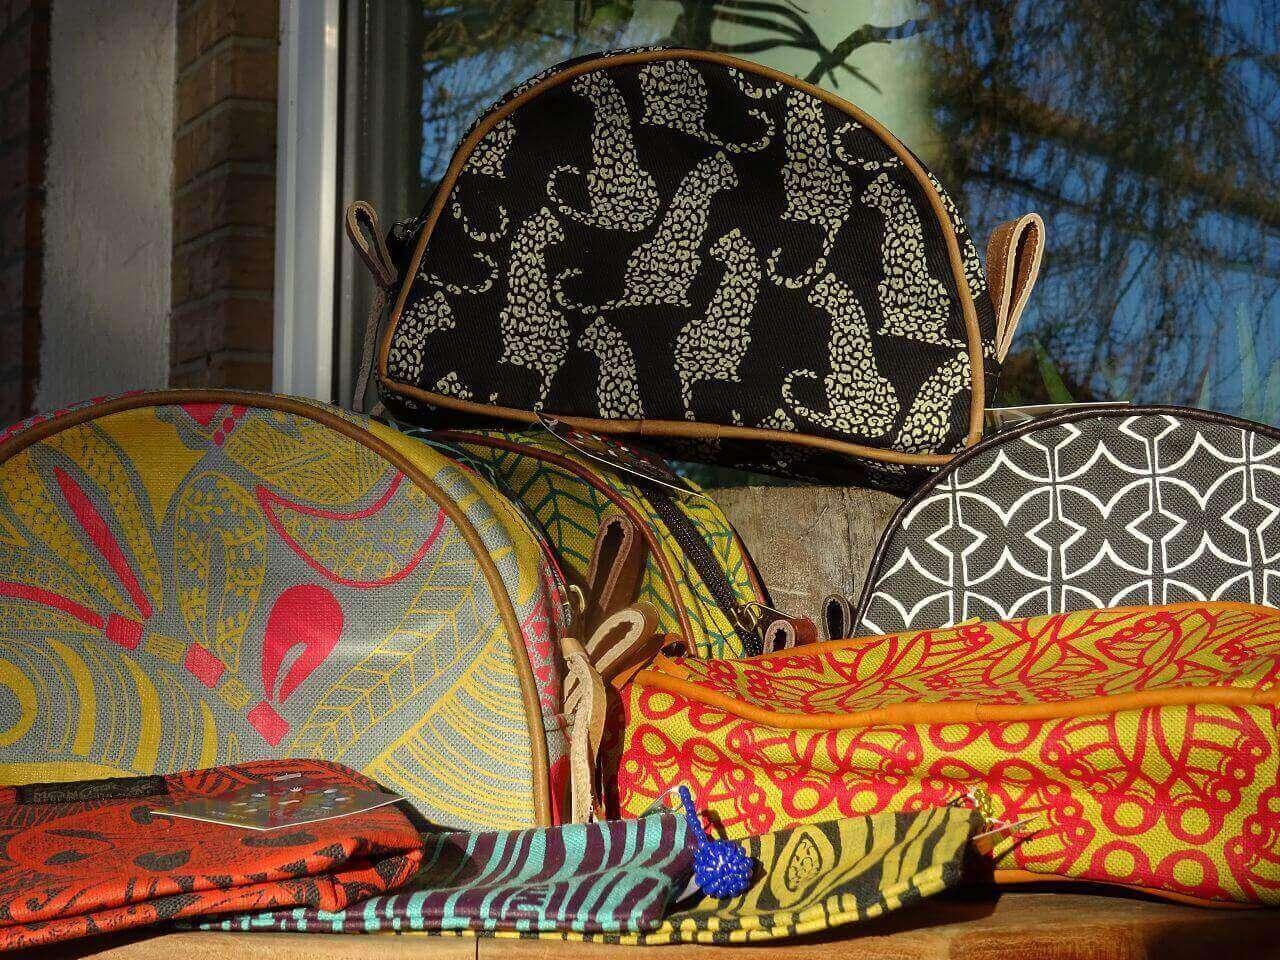 Mongoose handcrafted Bags - Taschen aus Südafrika